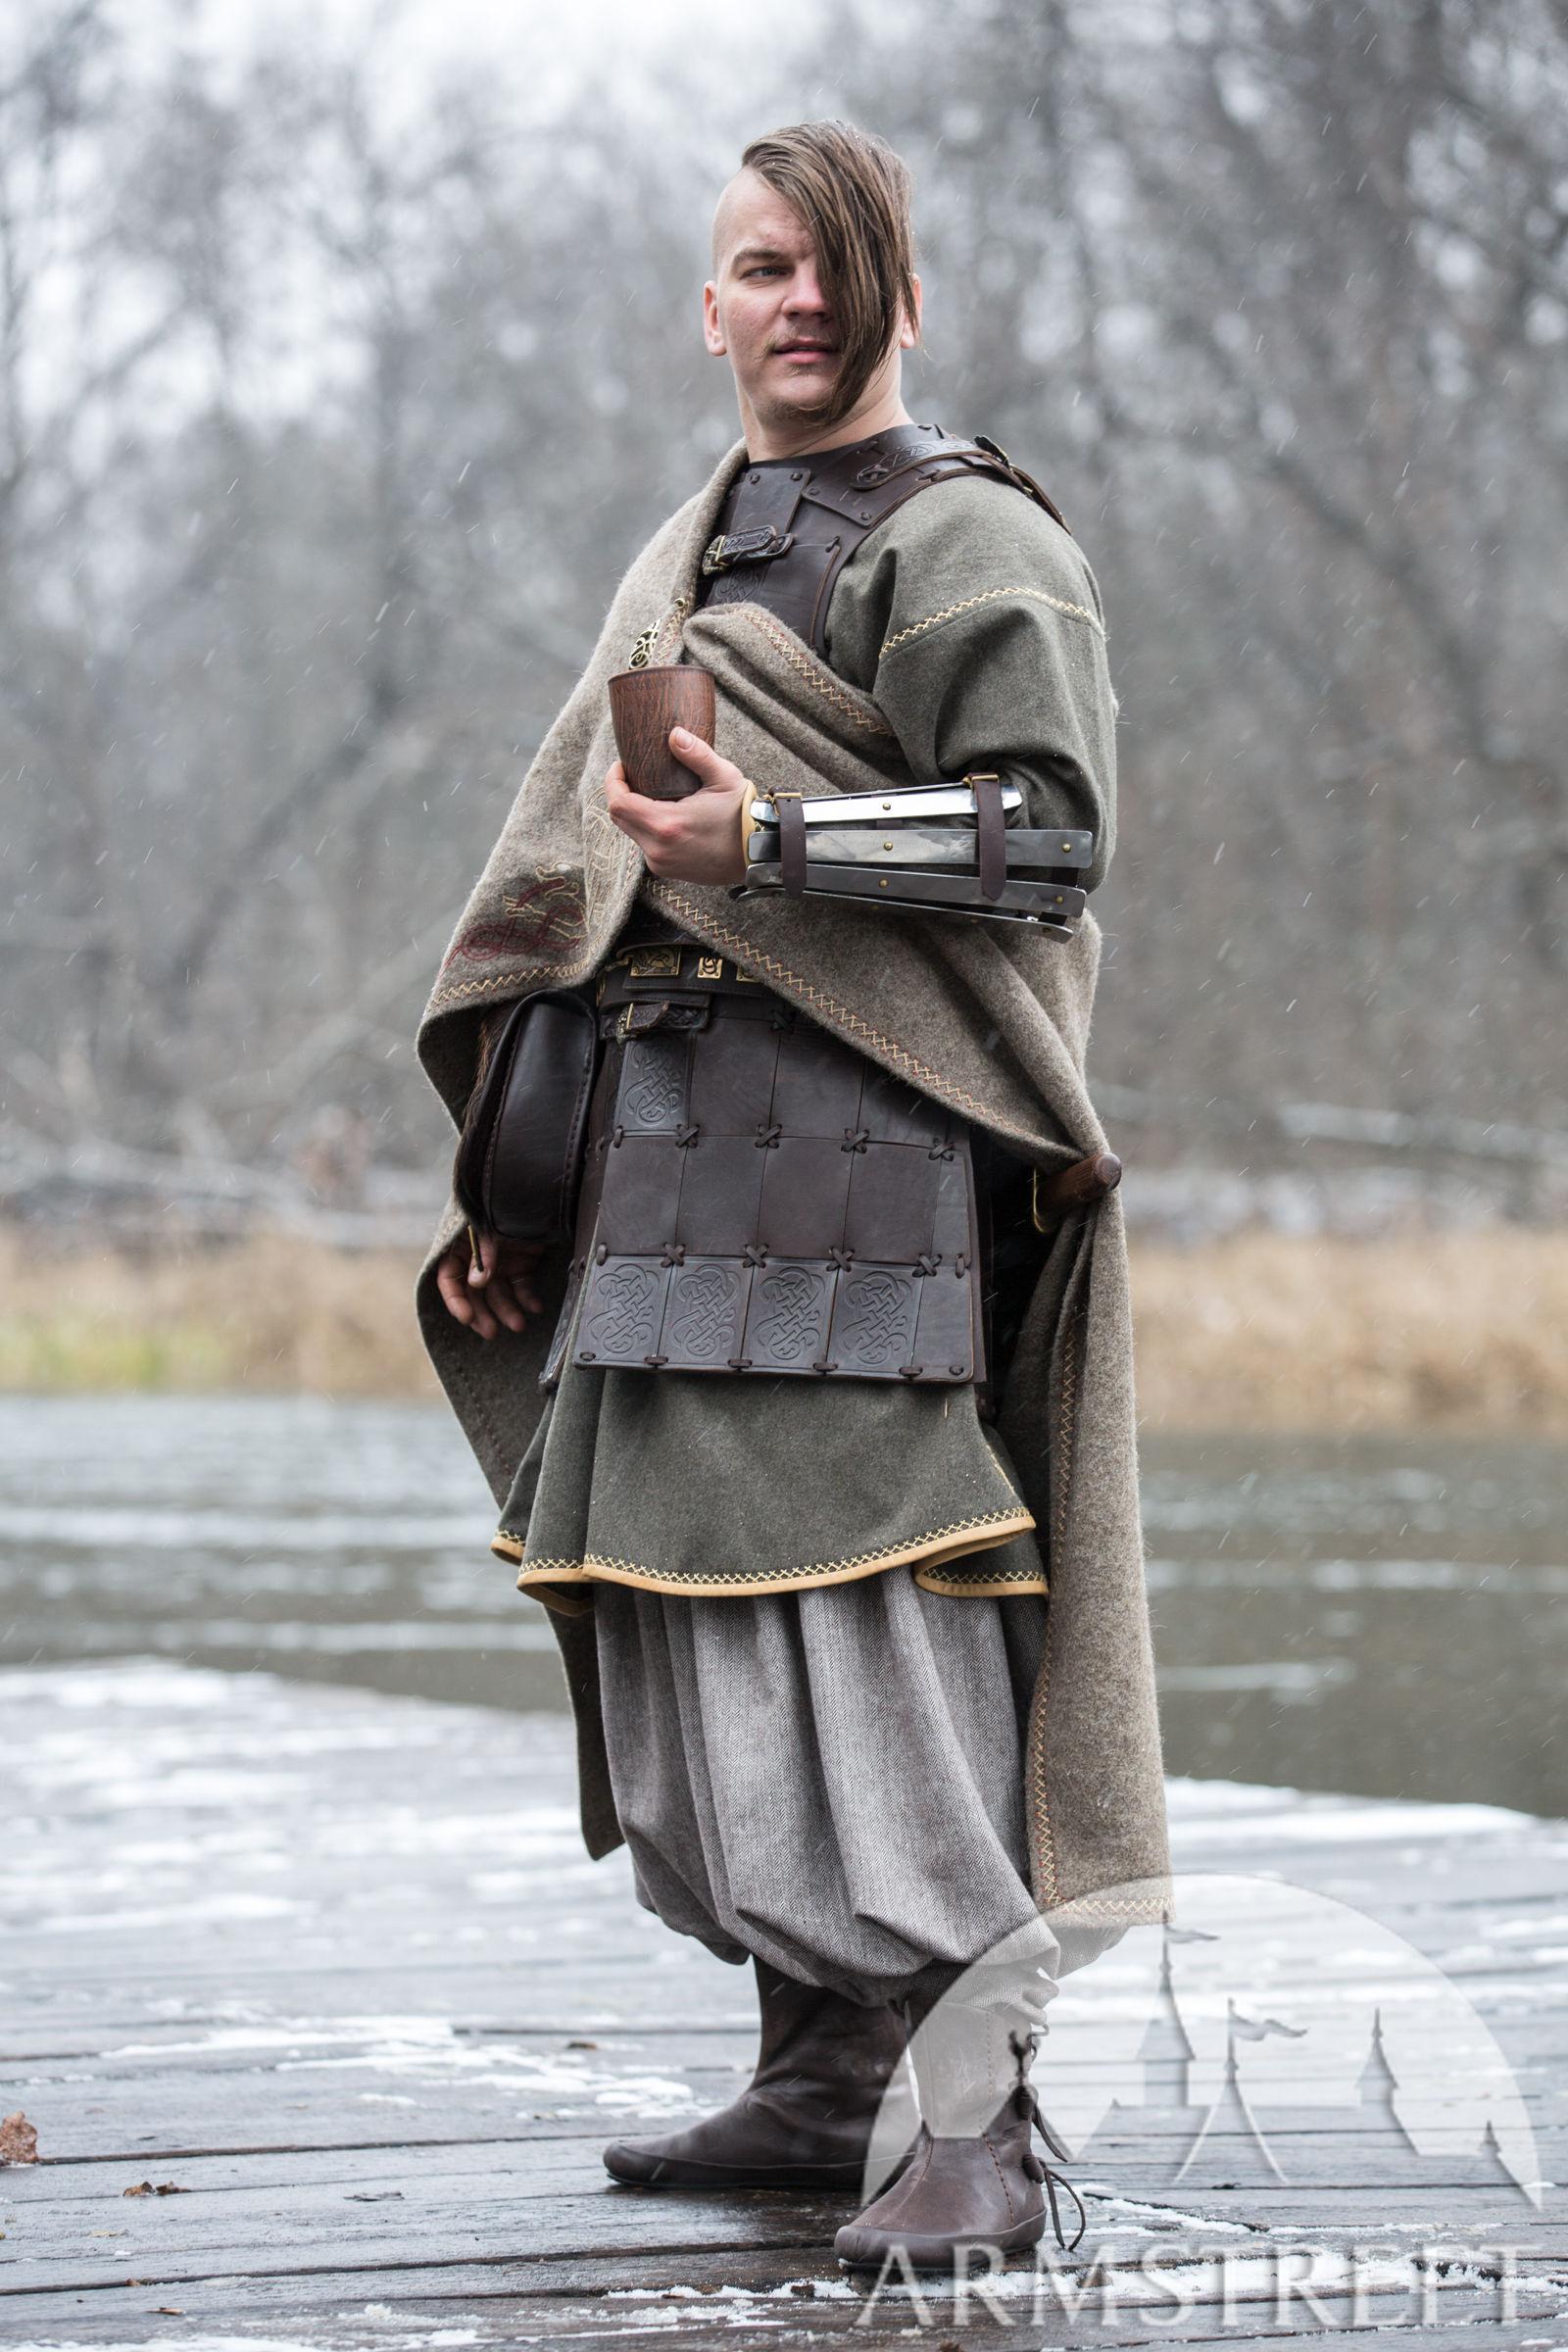 Olegg The Mercenary Viking Cloak With Embroidery For